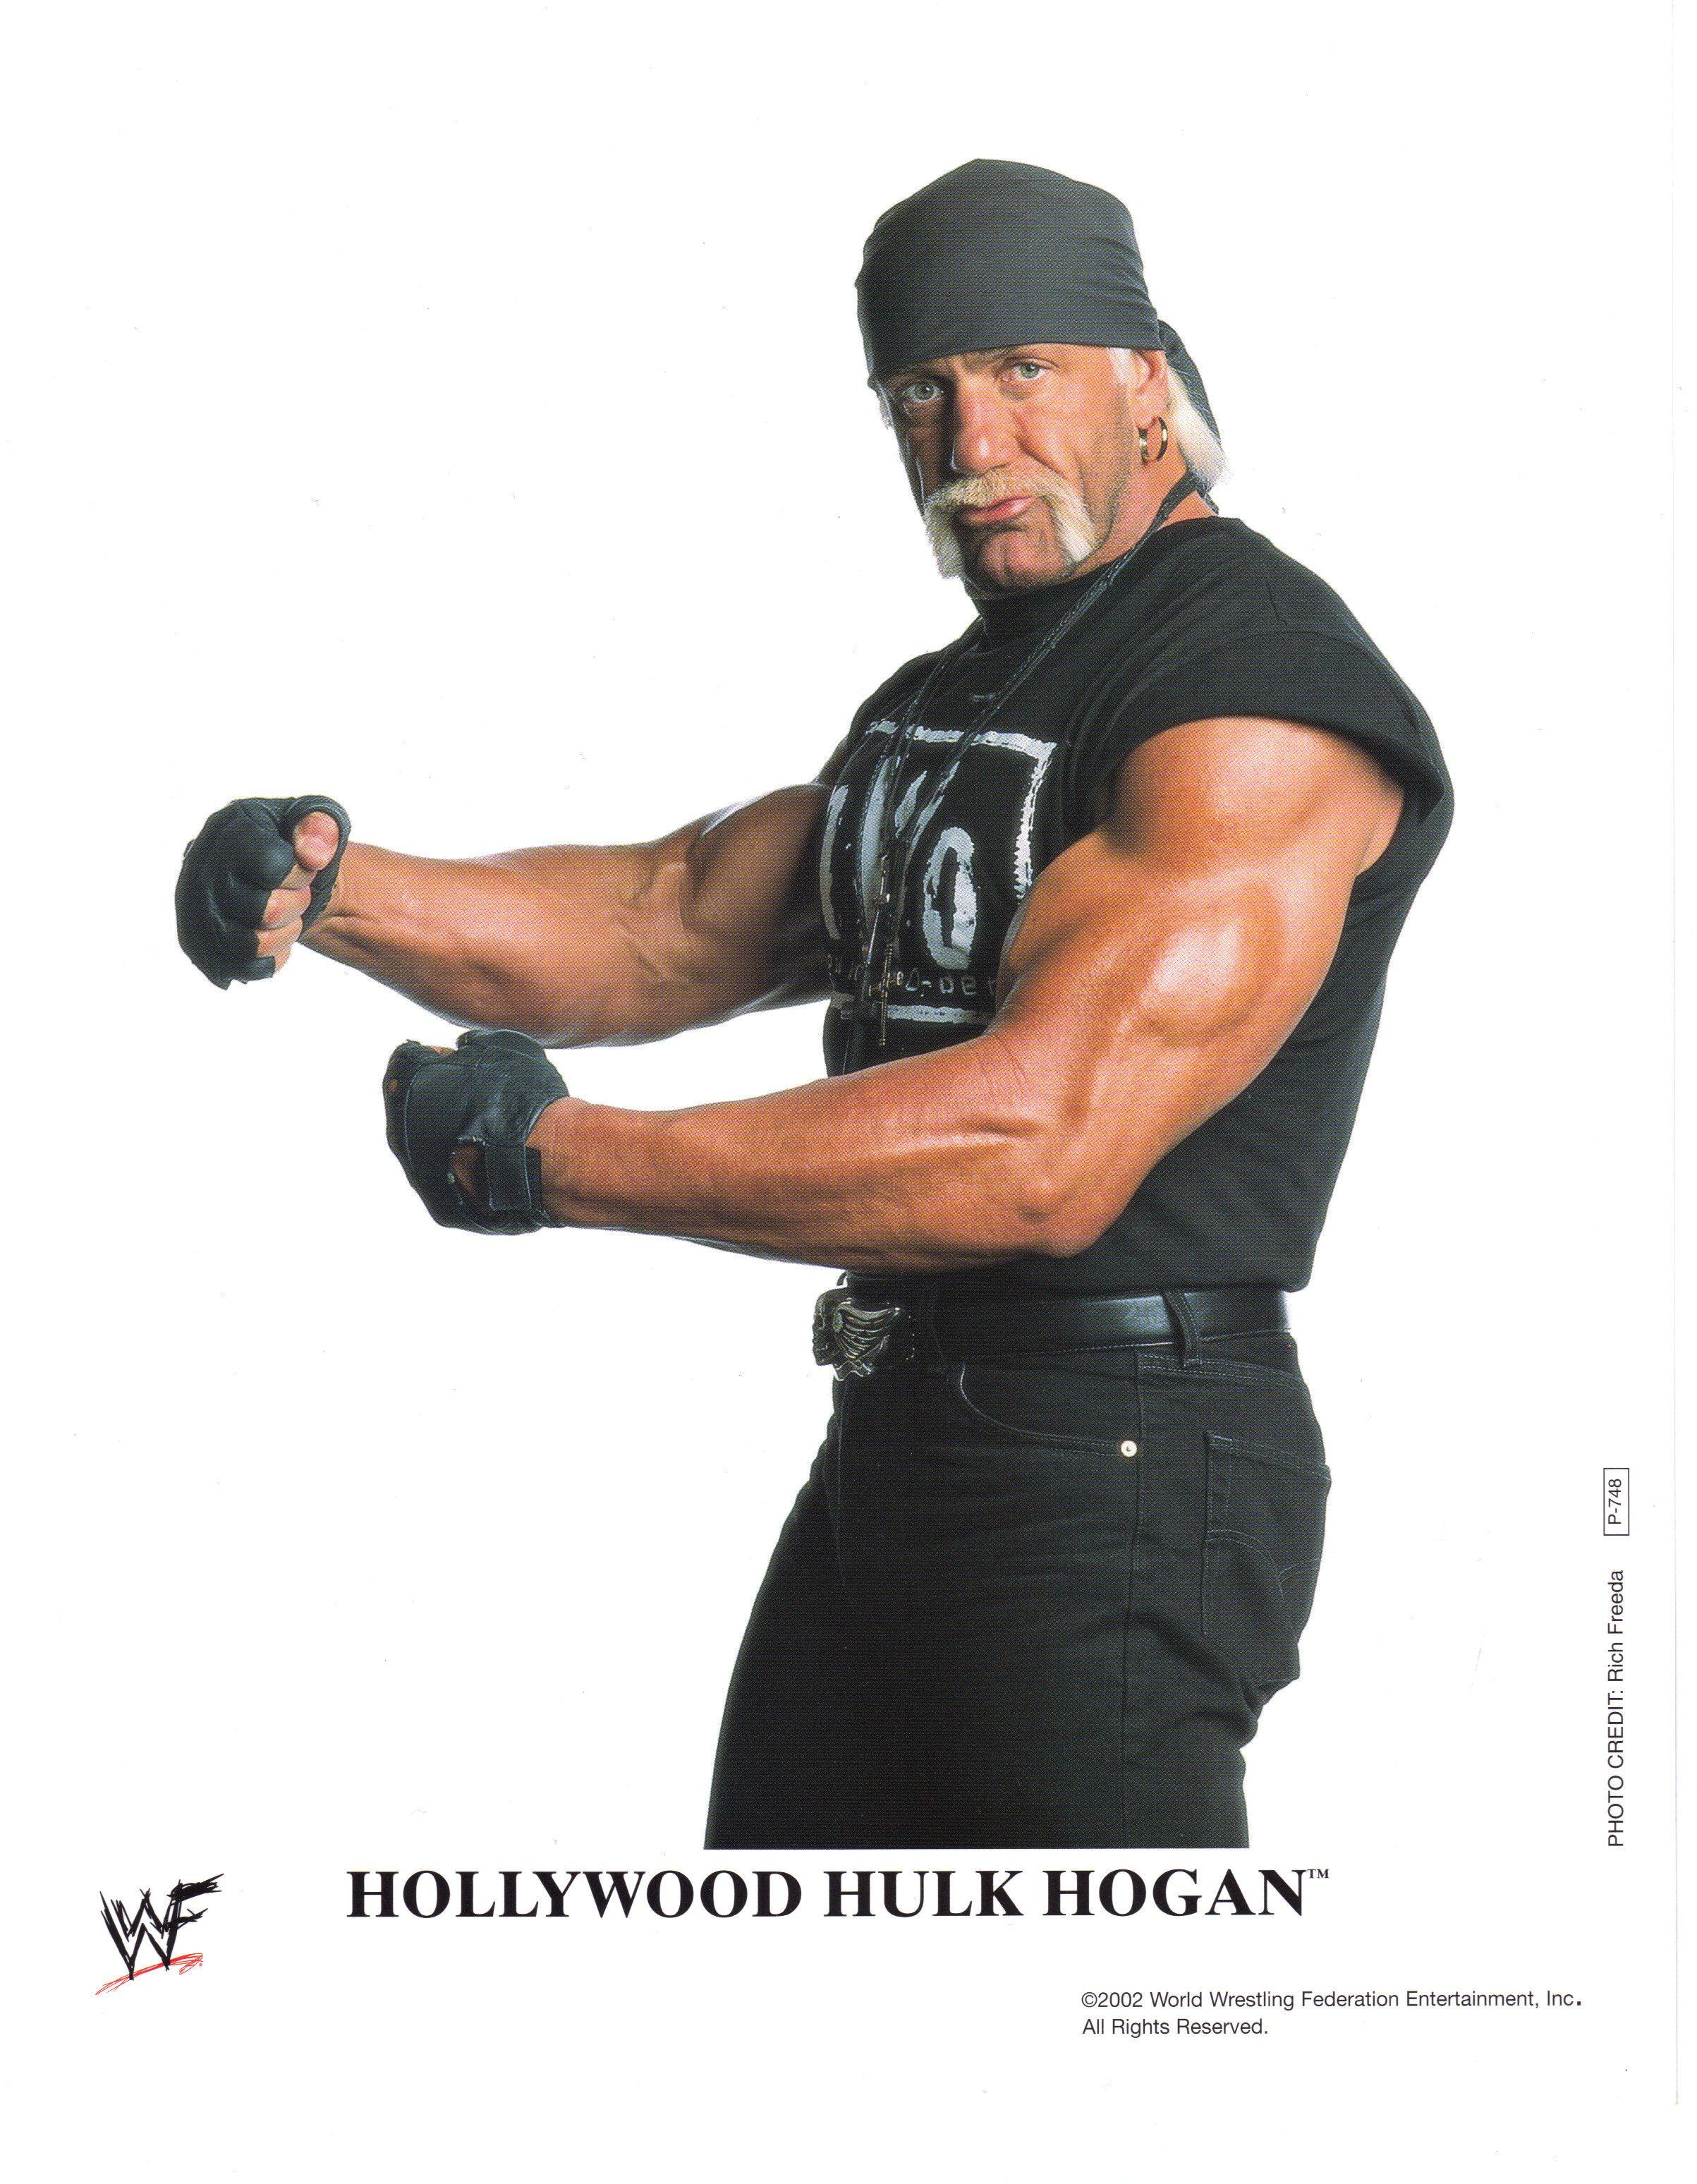 Hulk hogan record-1661